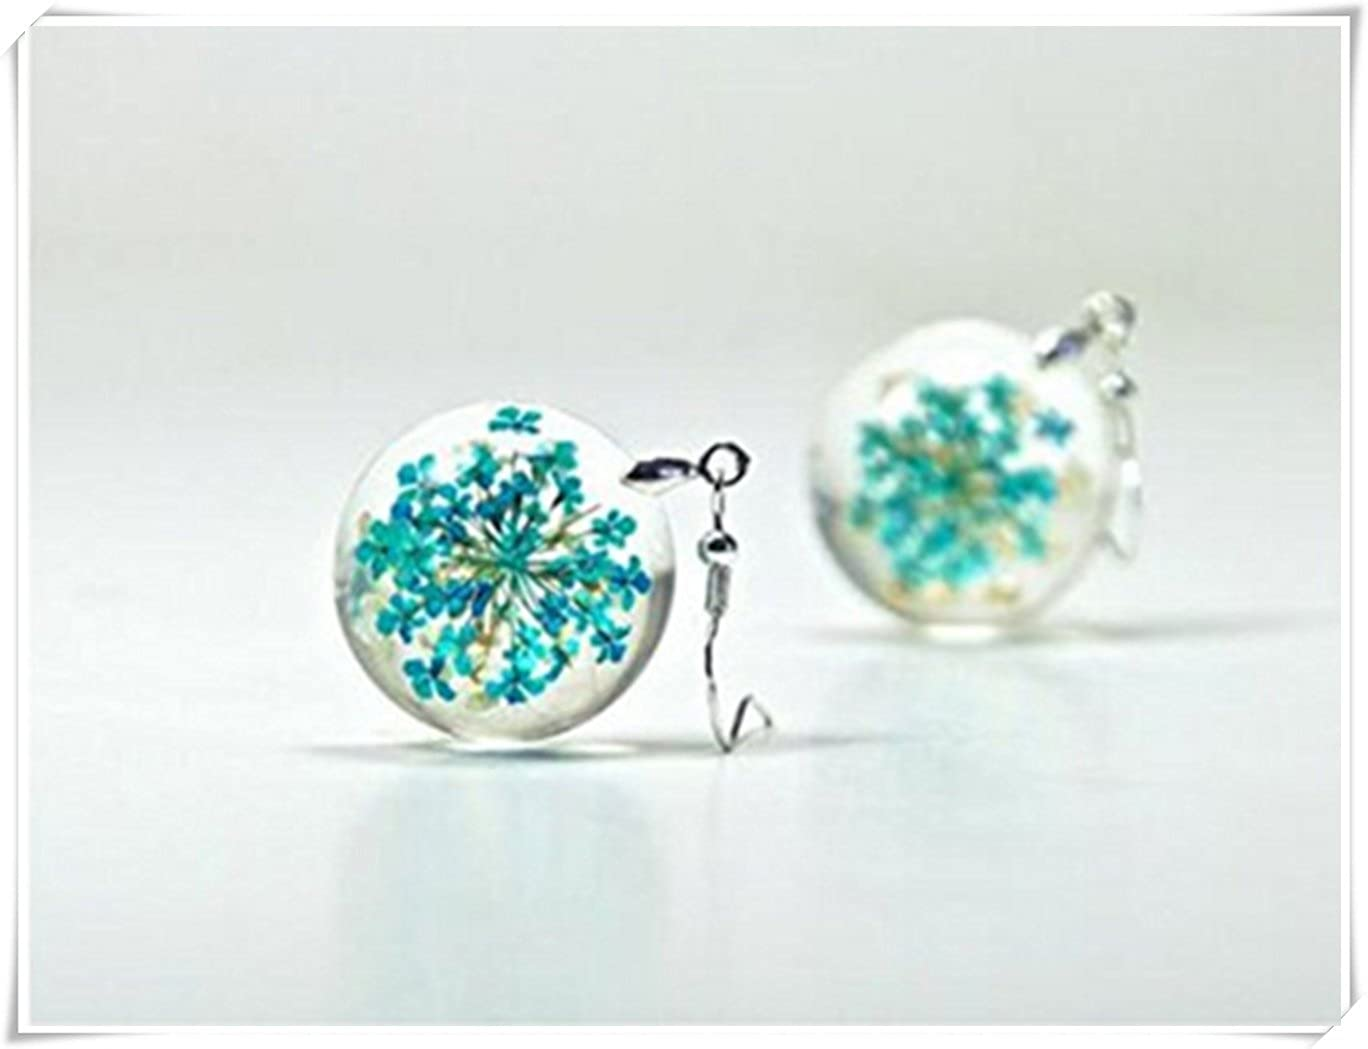 Terrarium Earrings Wooden Earrings Wood Resin Earrings Niobium Pressed Fire /& Ice Flower Earrings Resin Real Flower Jewelry